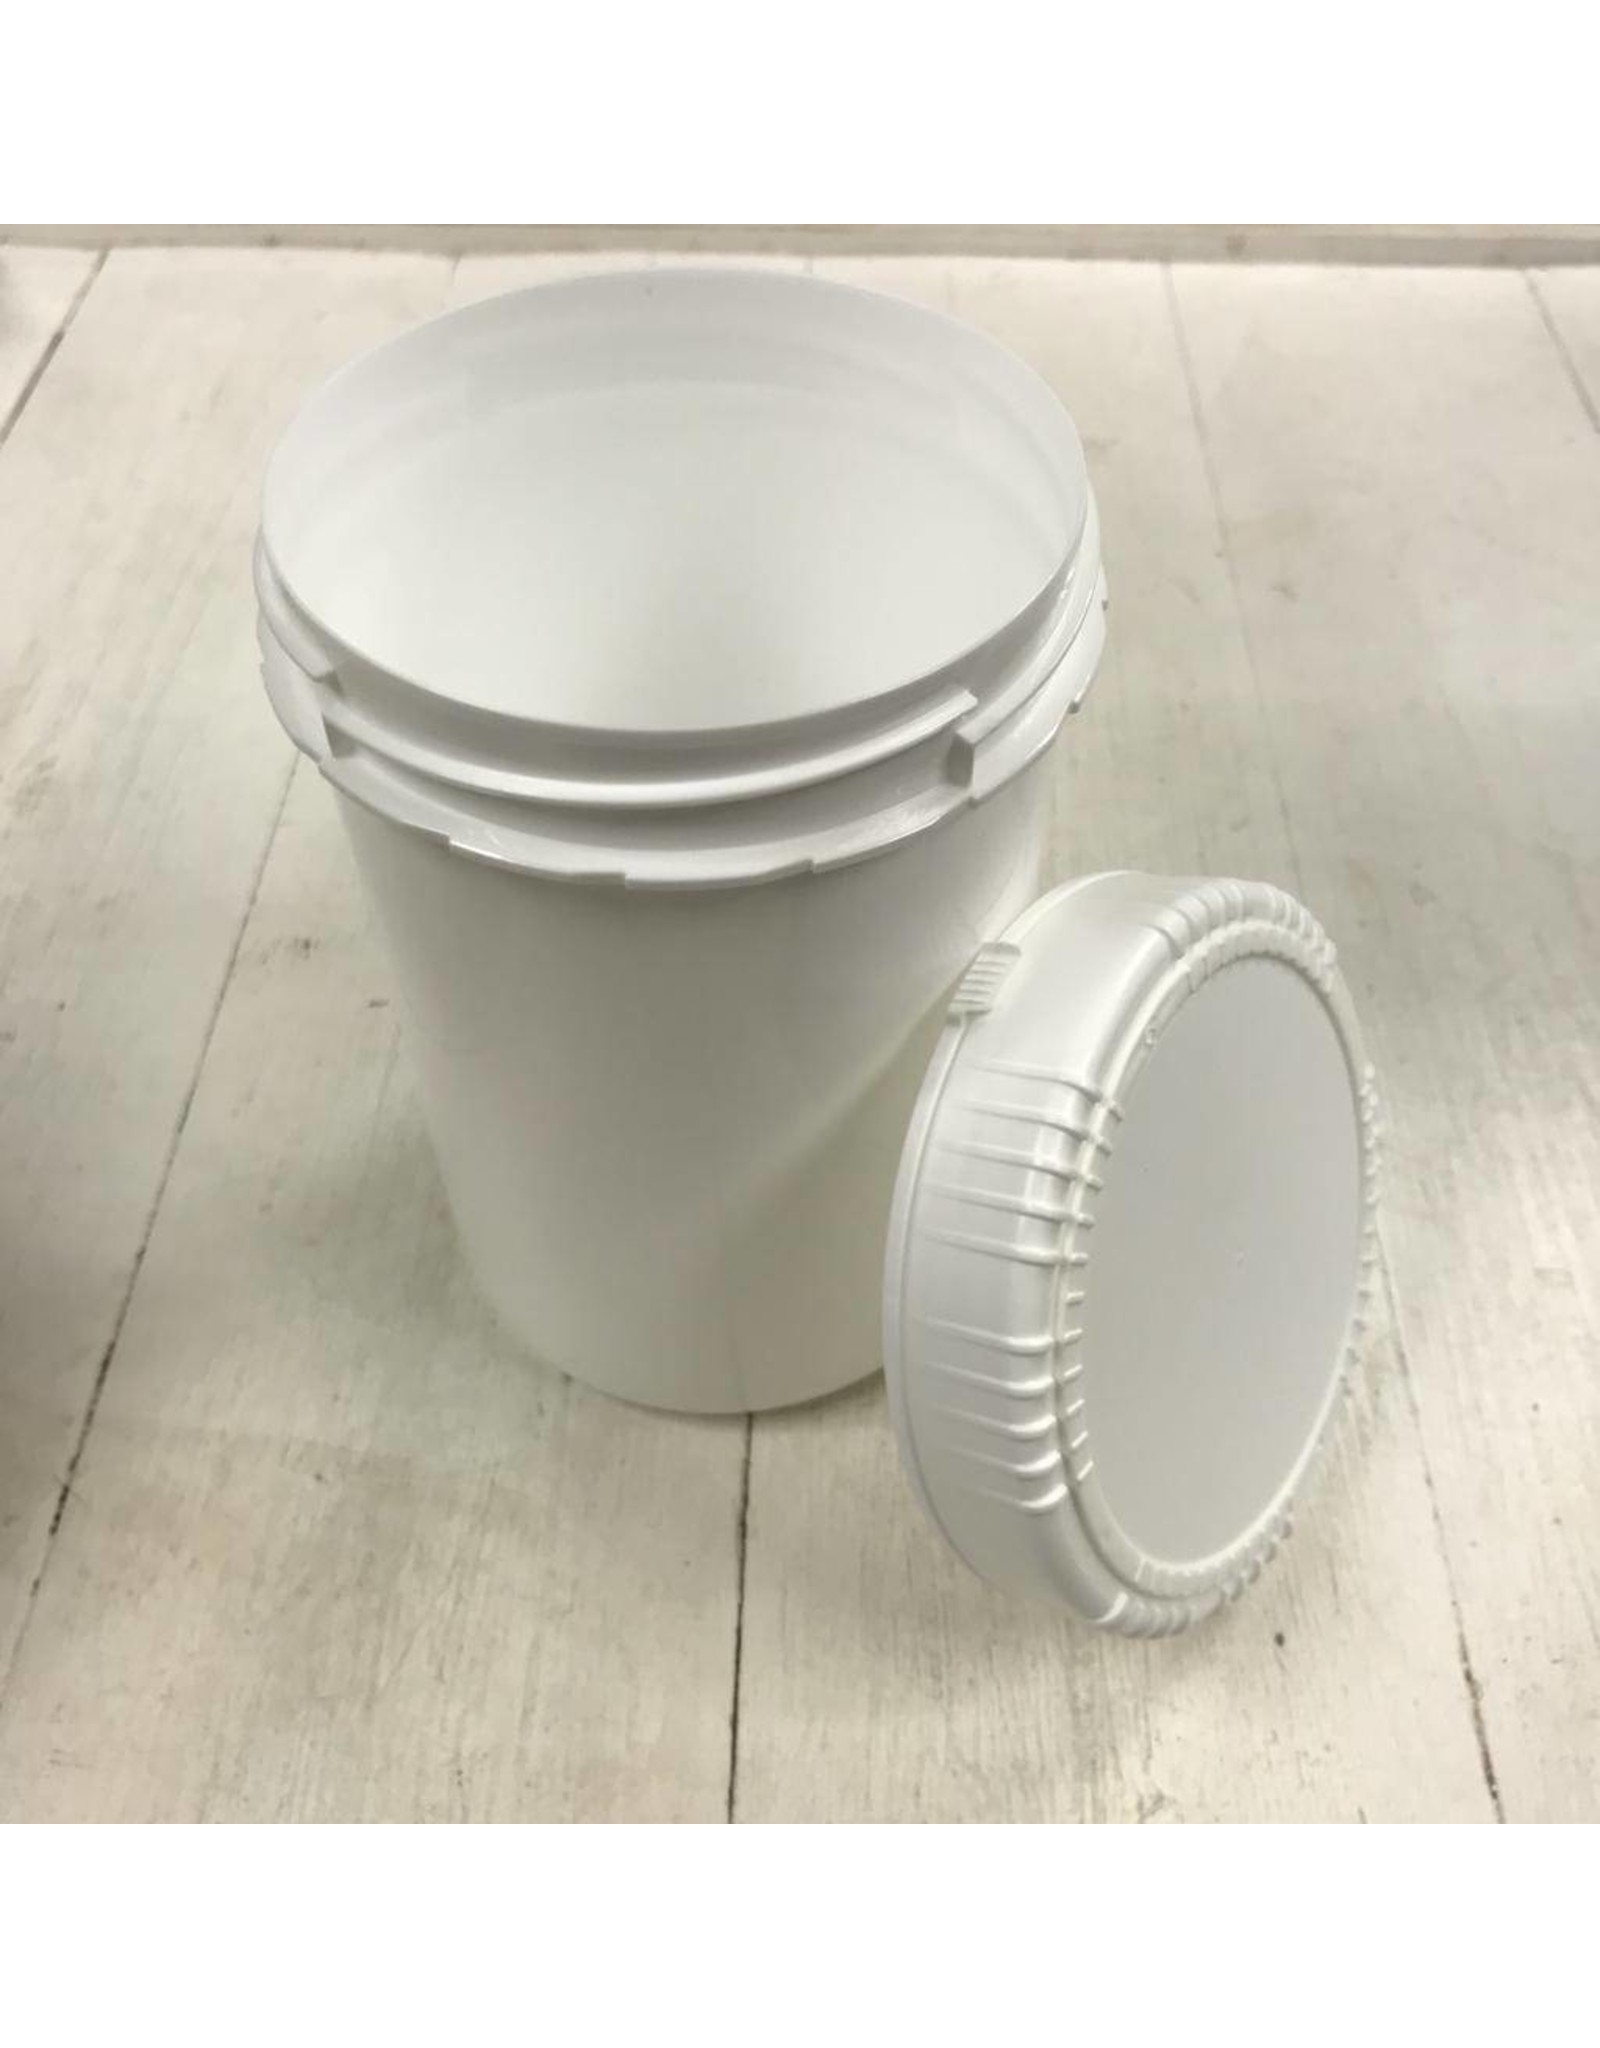 1000ml White plastic Jar